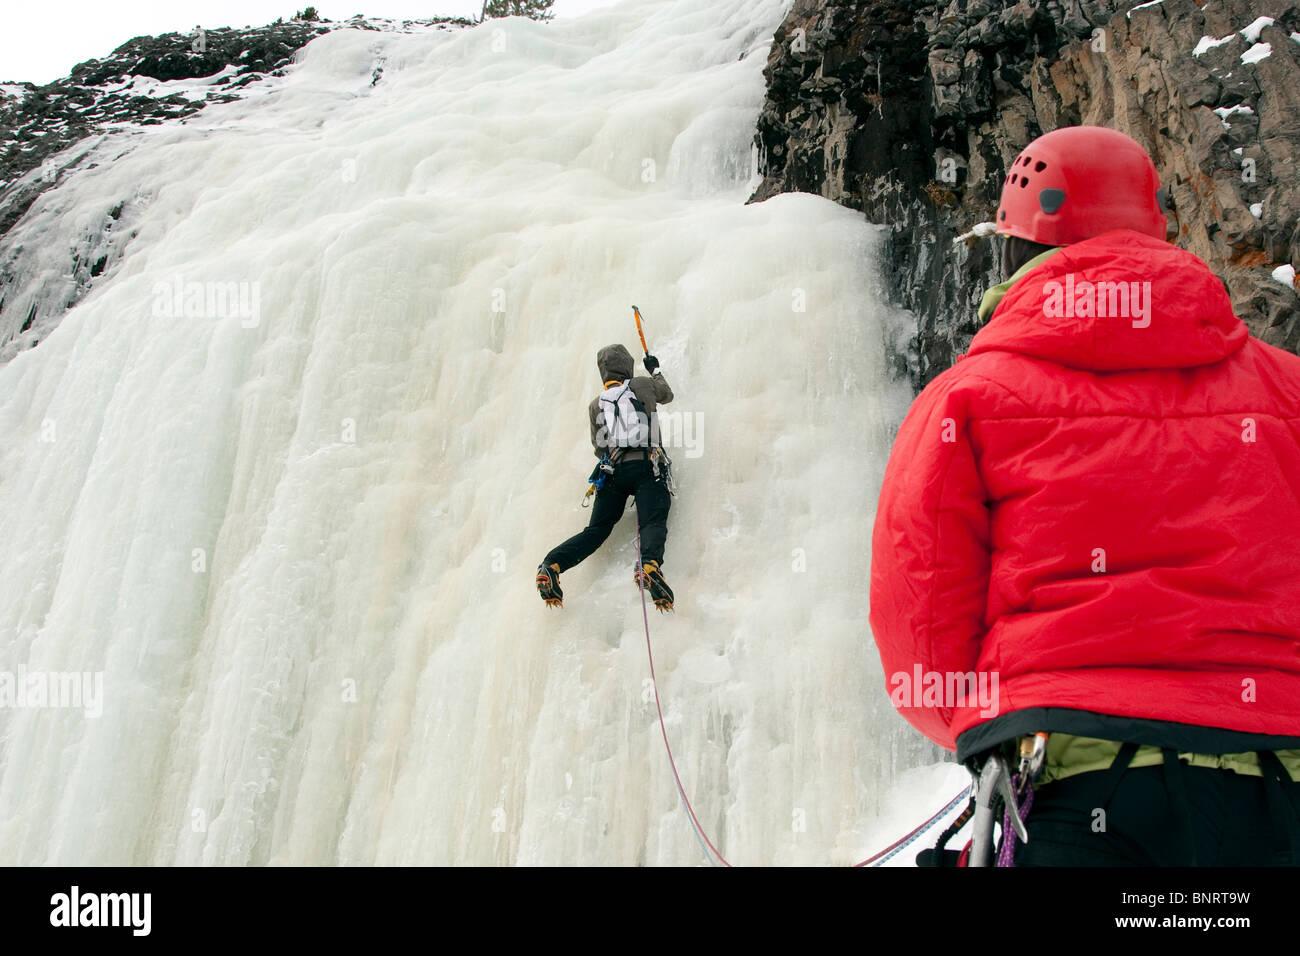 A man ice climbing. - Stock Image